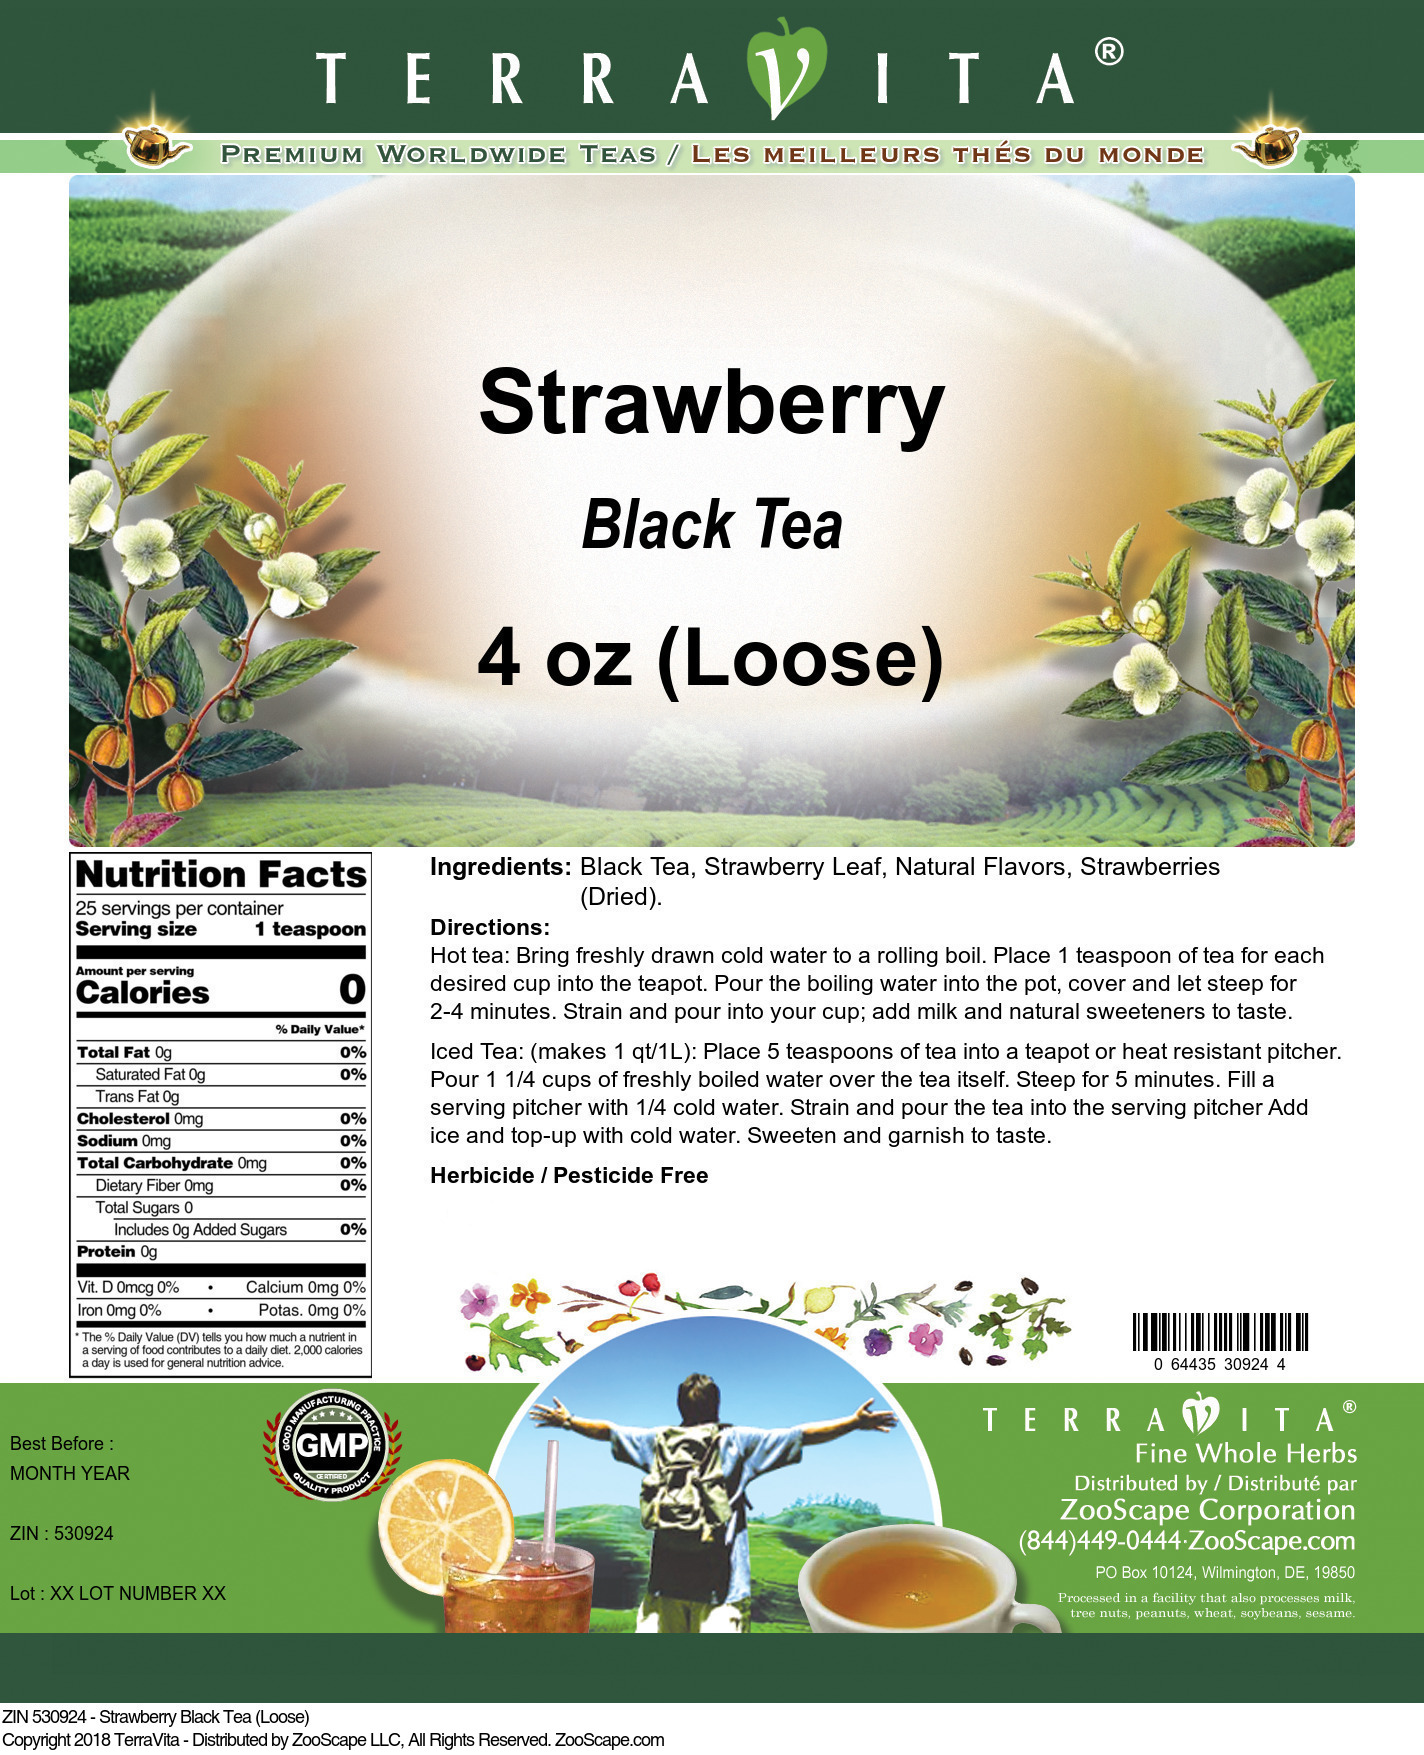 Strawberry Black Tea (Loose)